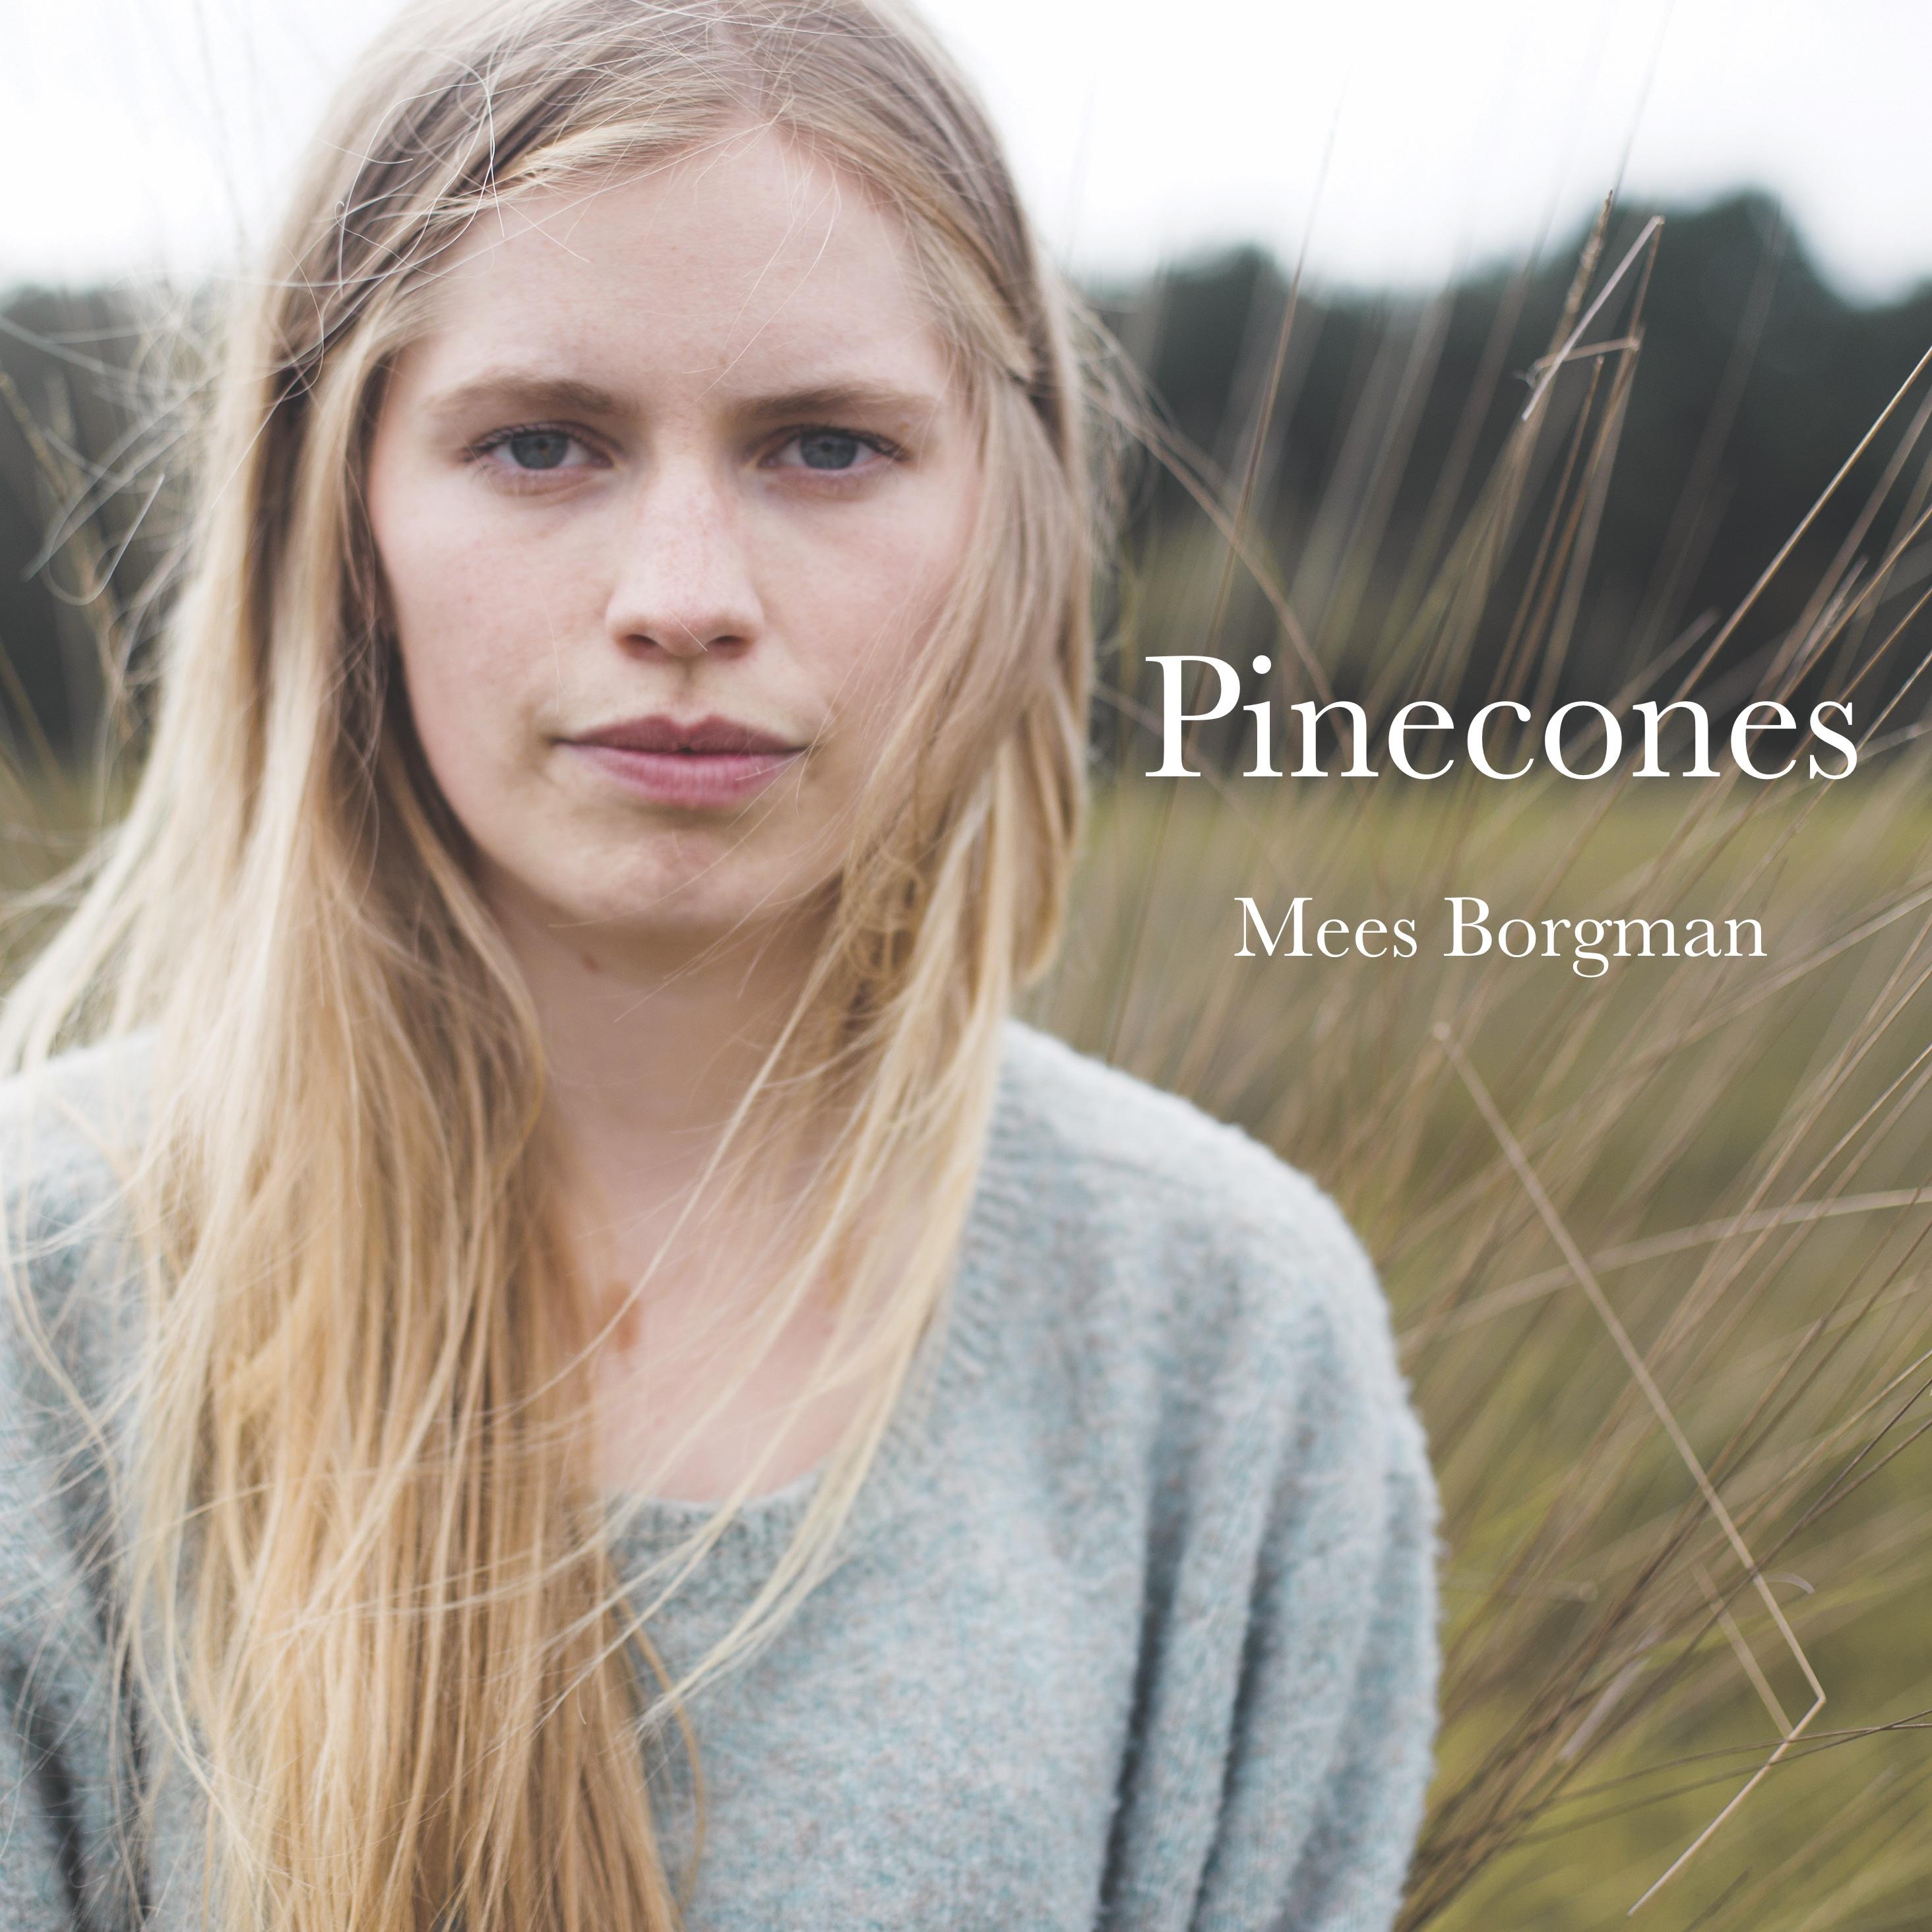 Pinecones - Mees Borgman